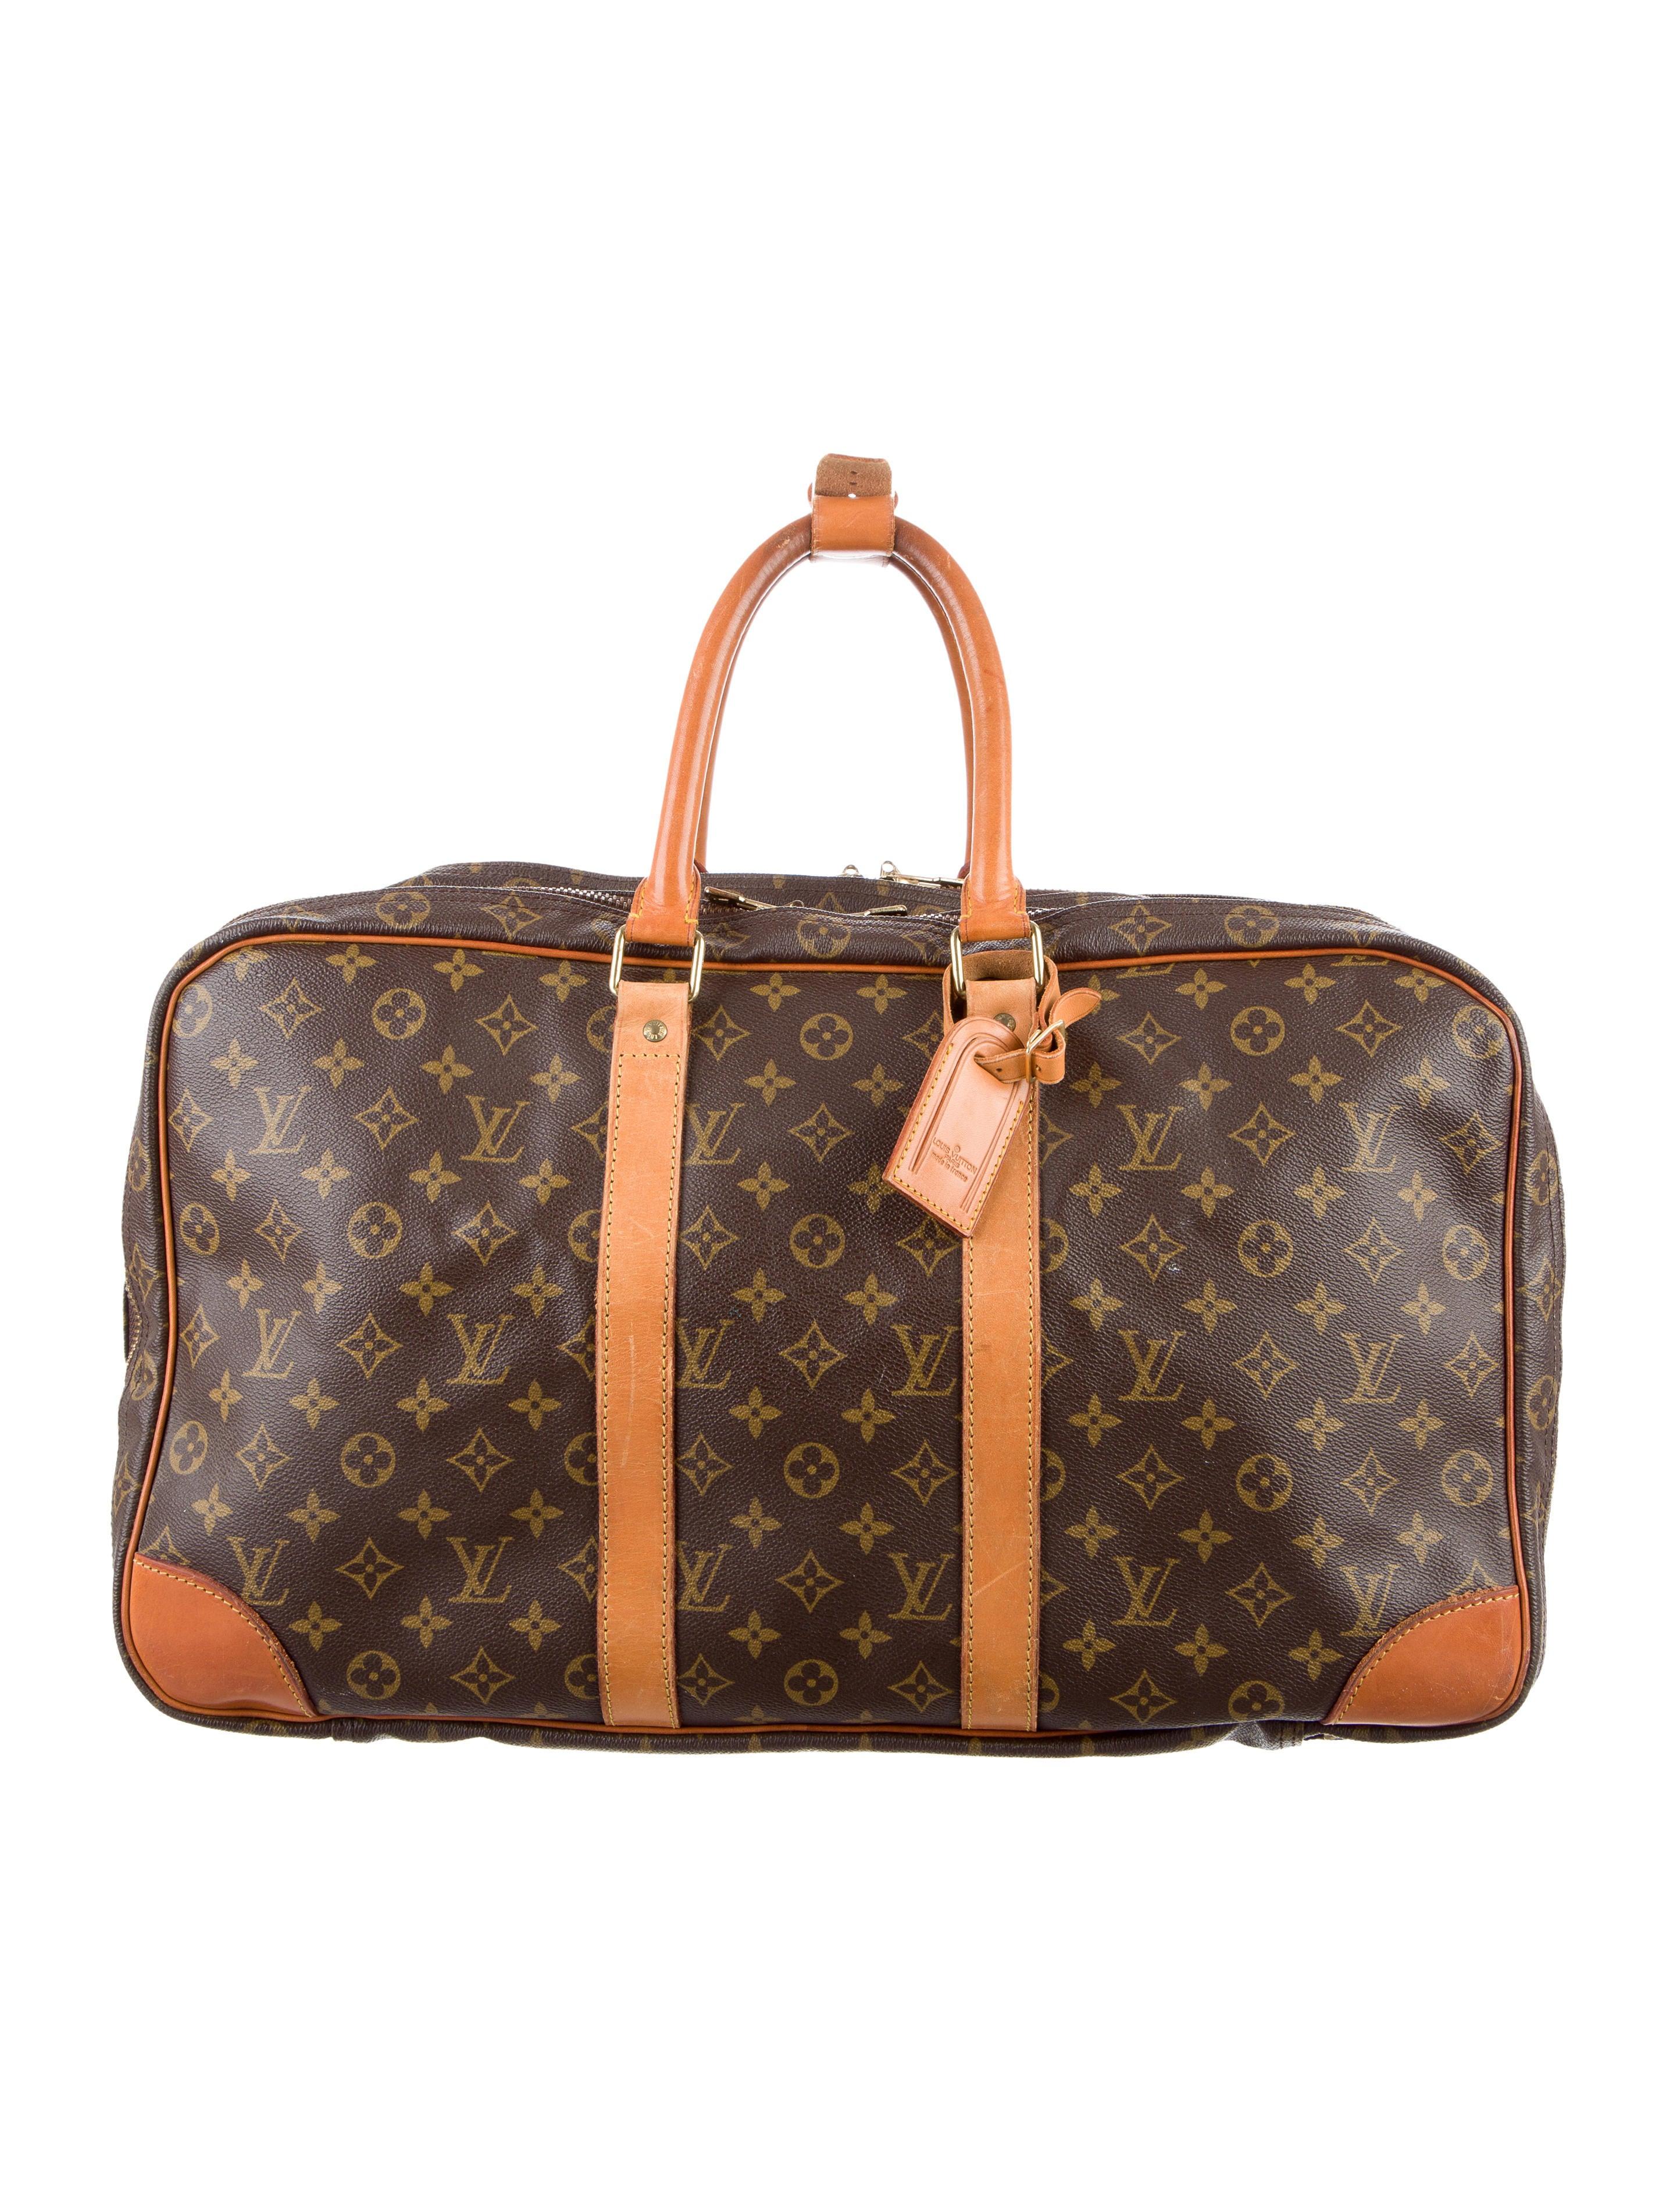 Contemporary Flatware Louis Vuitton Vintage Monogram Sac 3 Poches Handbags